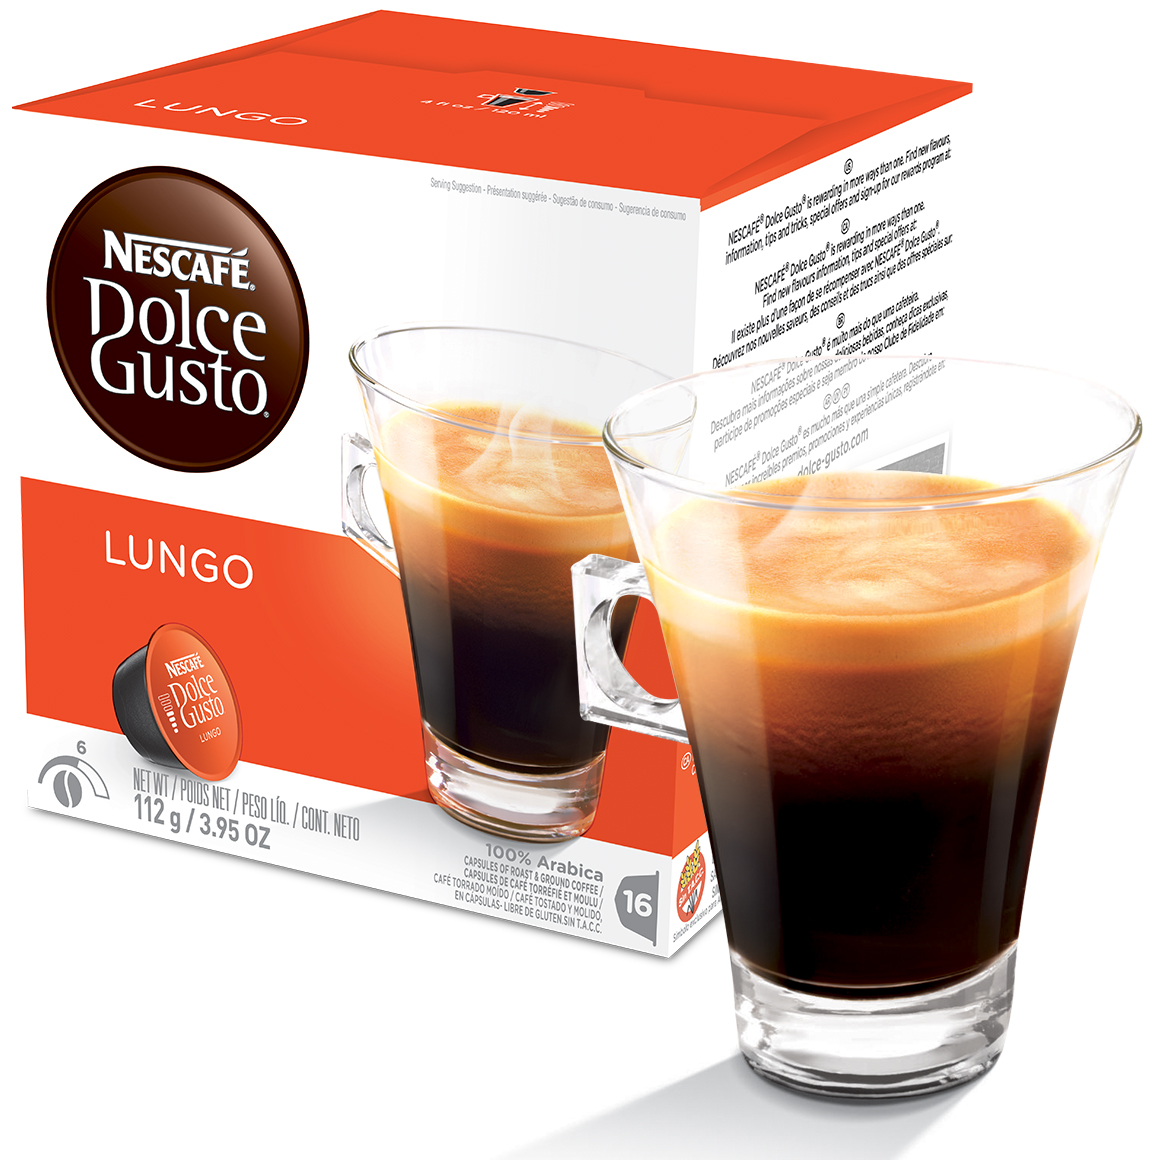 Cápsula Nescafé Dolce Gusto Café Lungo 16 Cápsulas - Nestlé